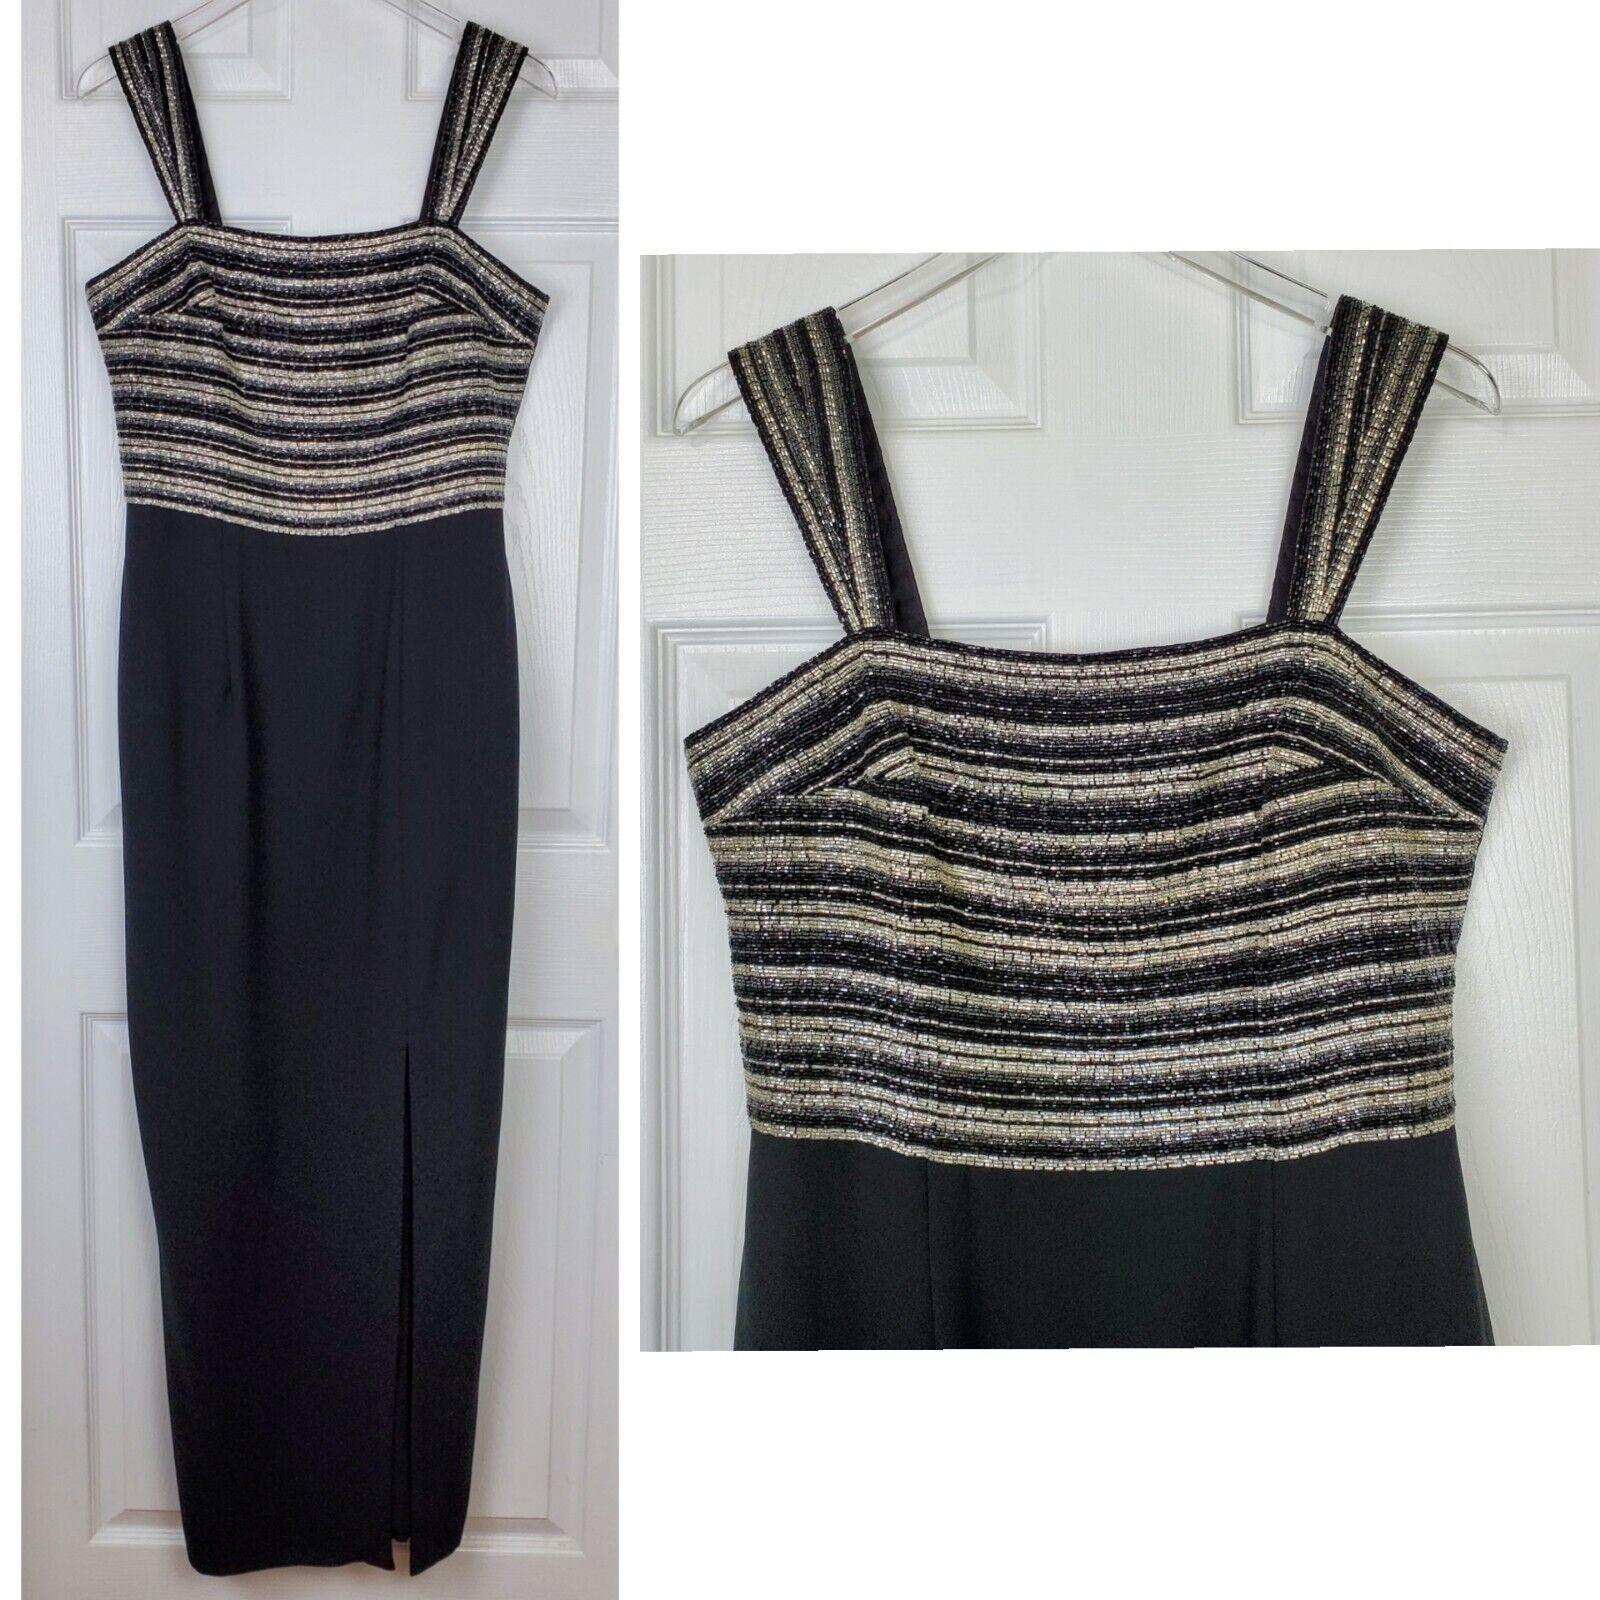 Montage mon cheri size 12 black sleeveless beaded dress